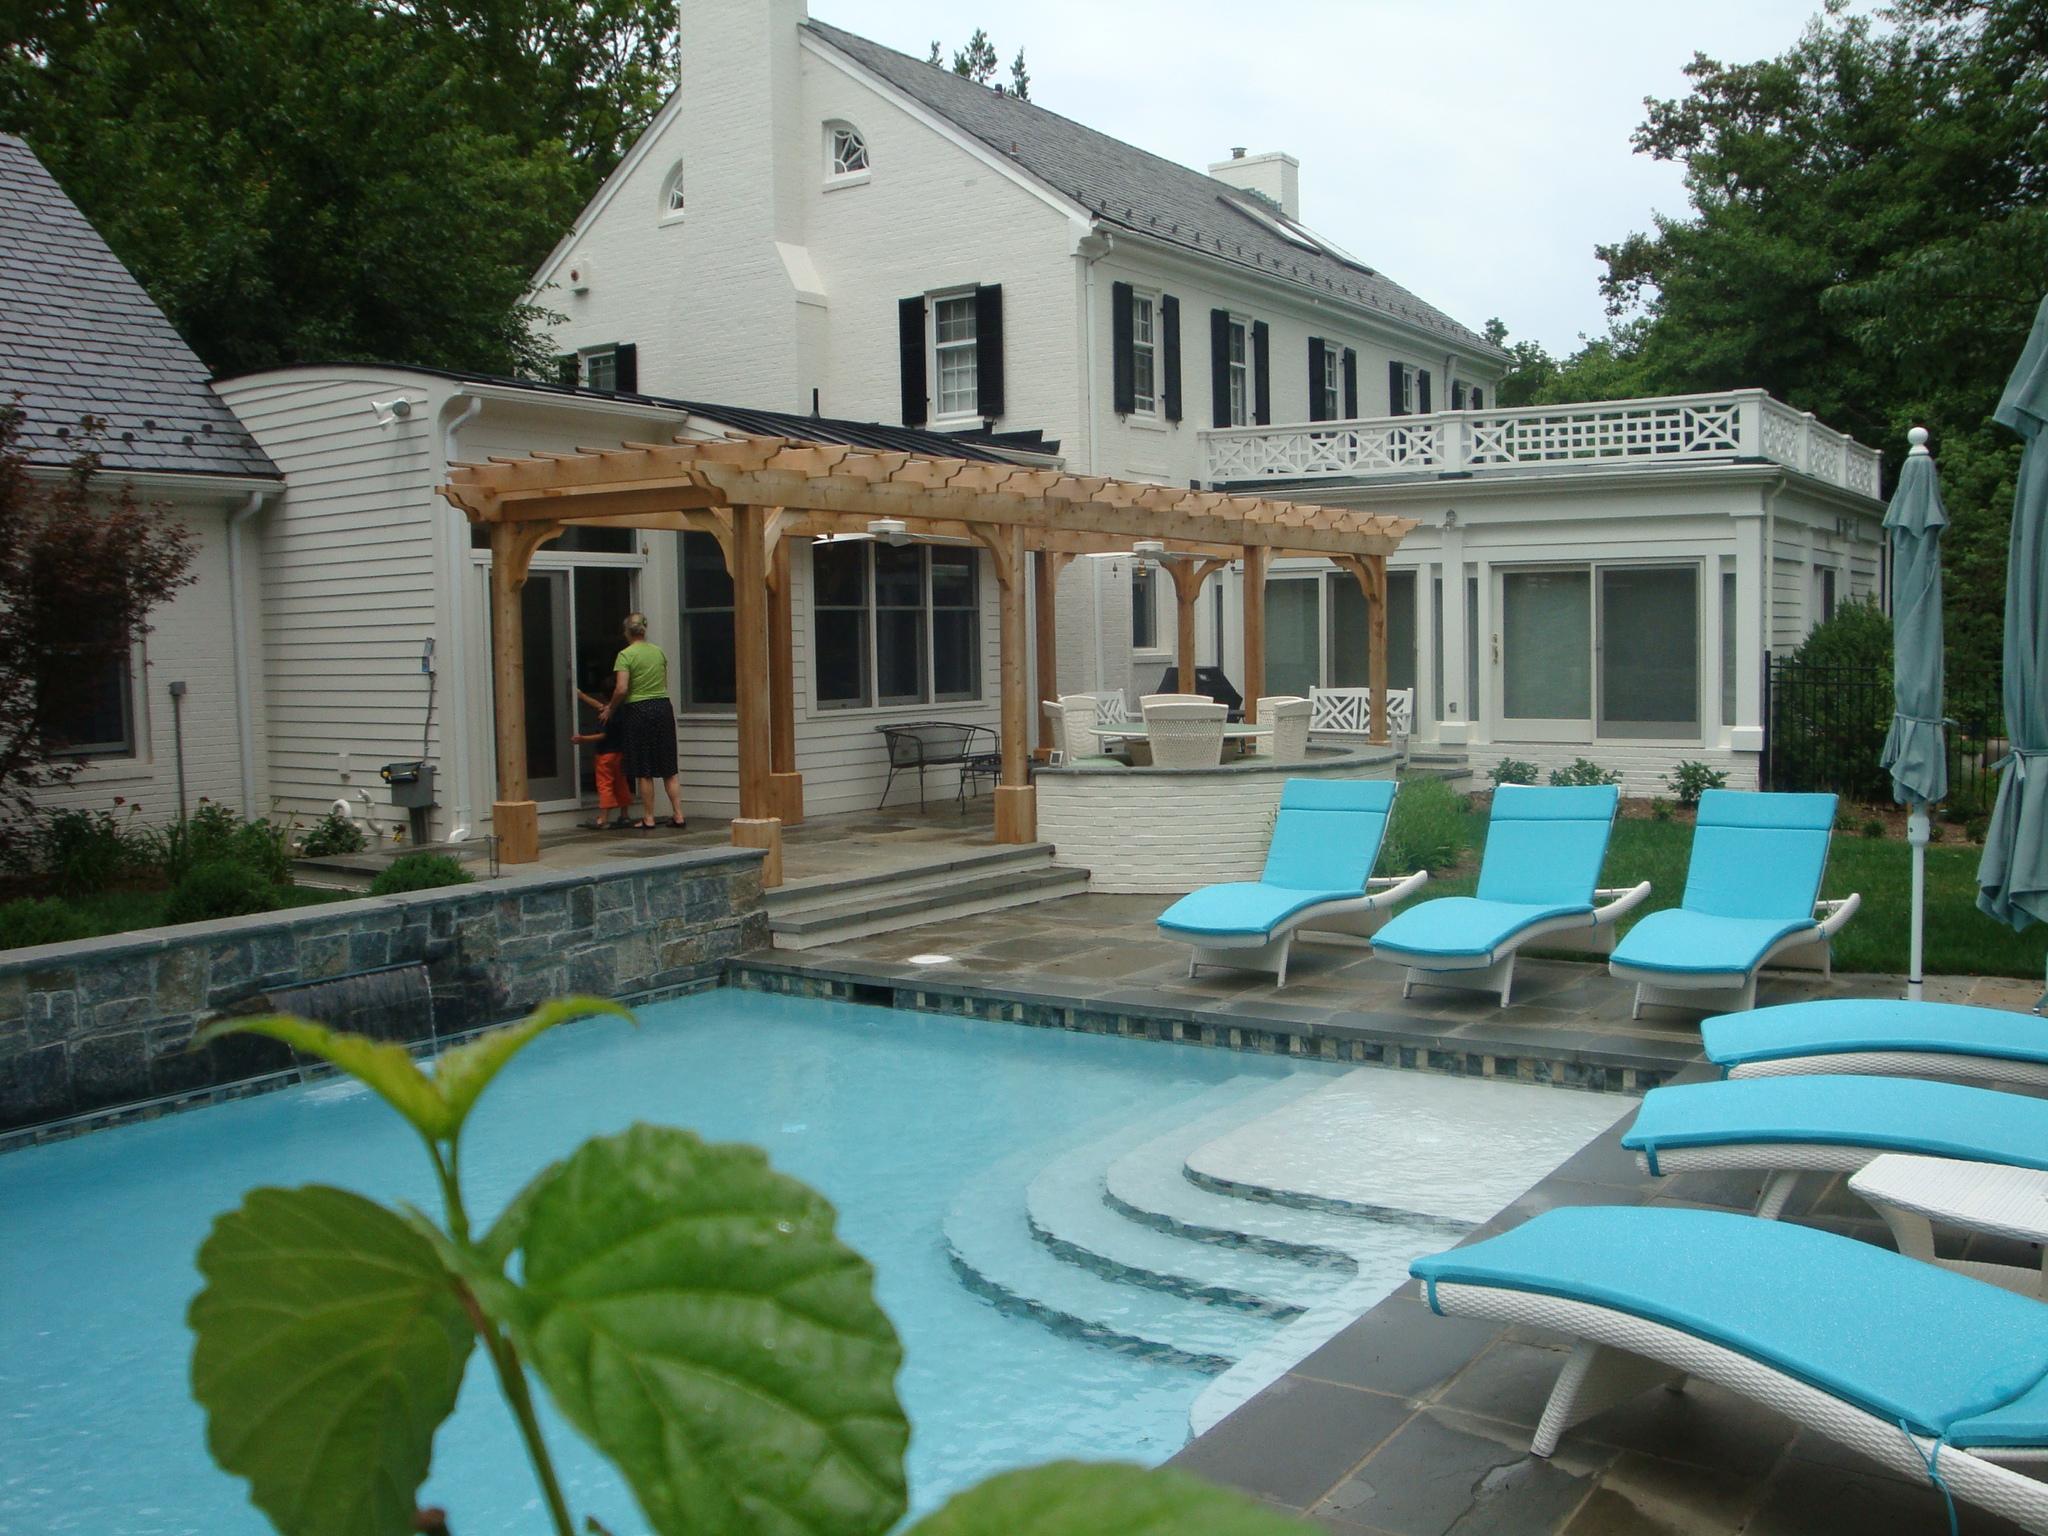 Fredericksburg Pool, Patio & Pergola Design ... on Pool Patio Design id=43629